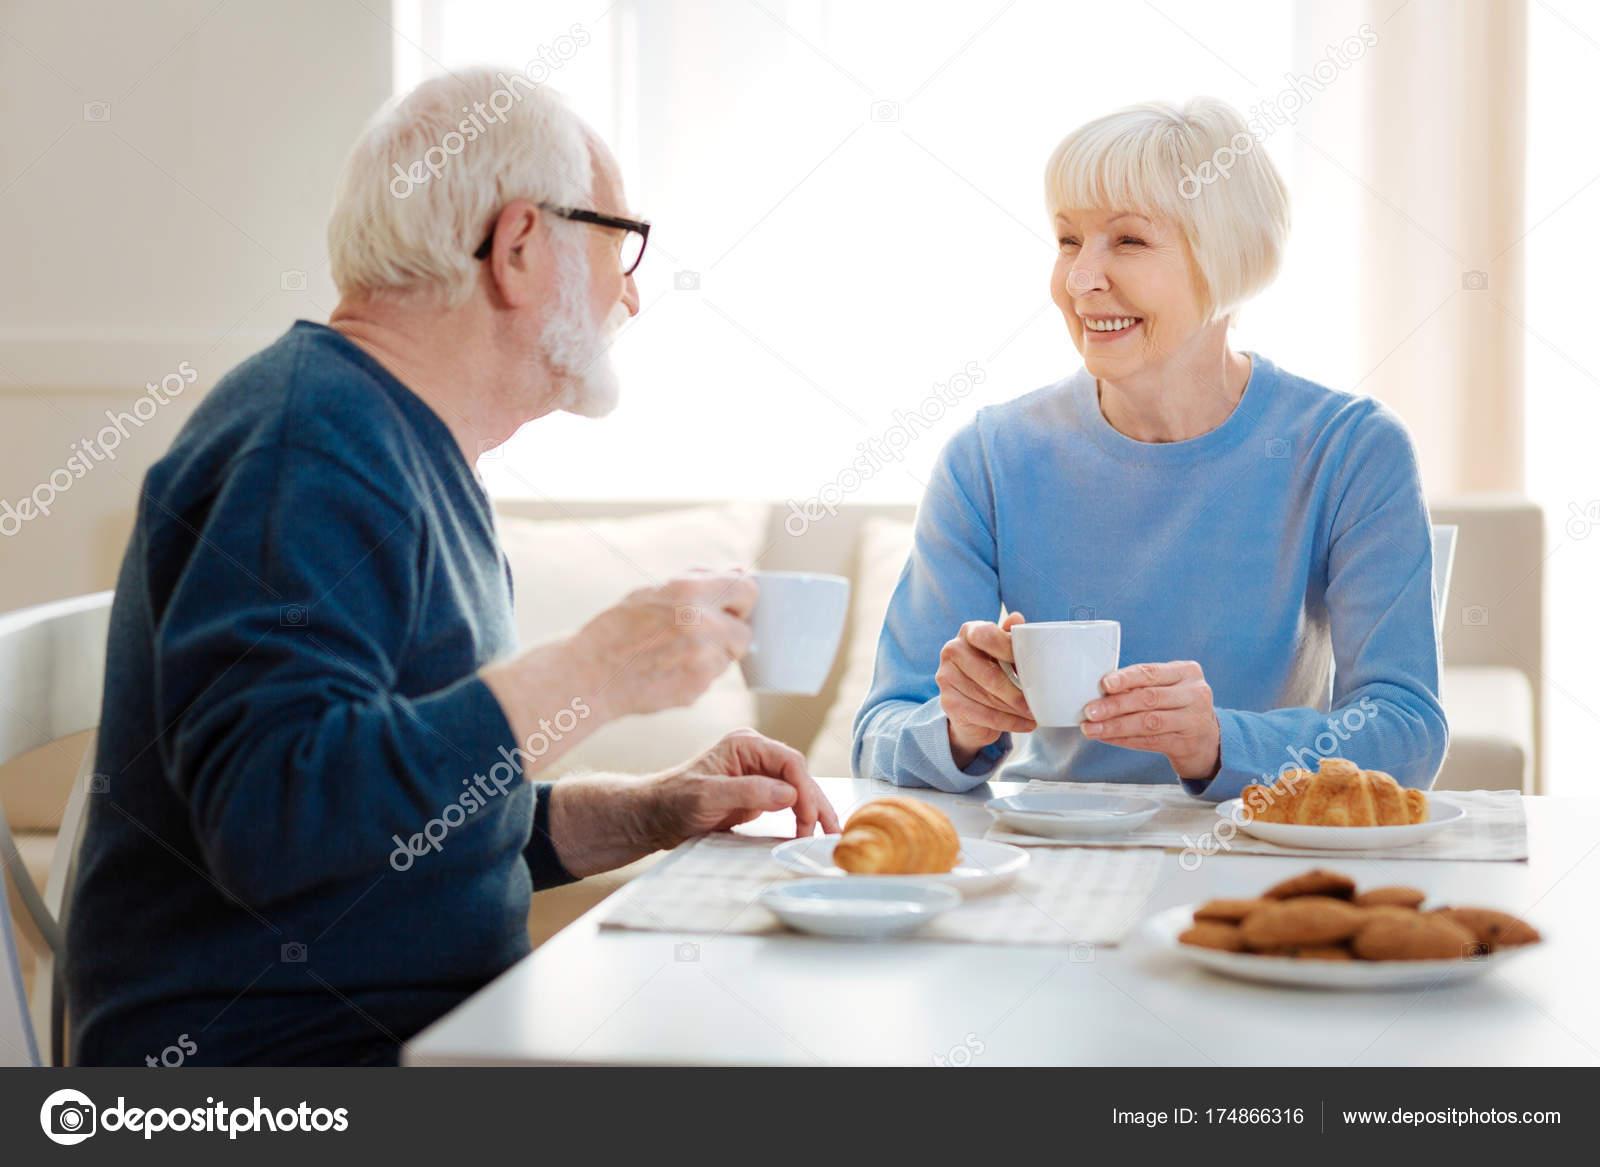 wie man einen älteren Mann erfreut